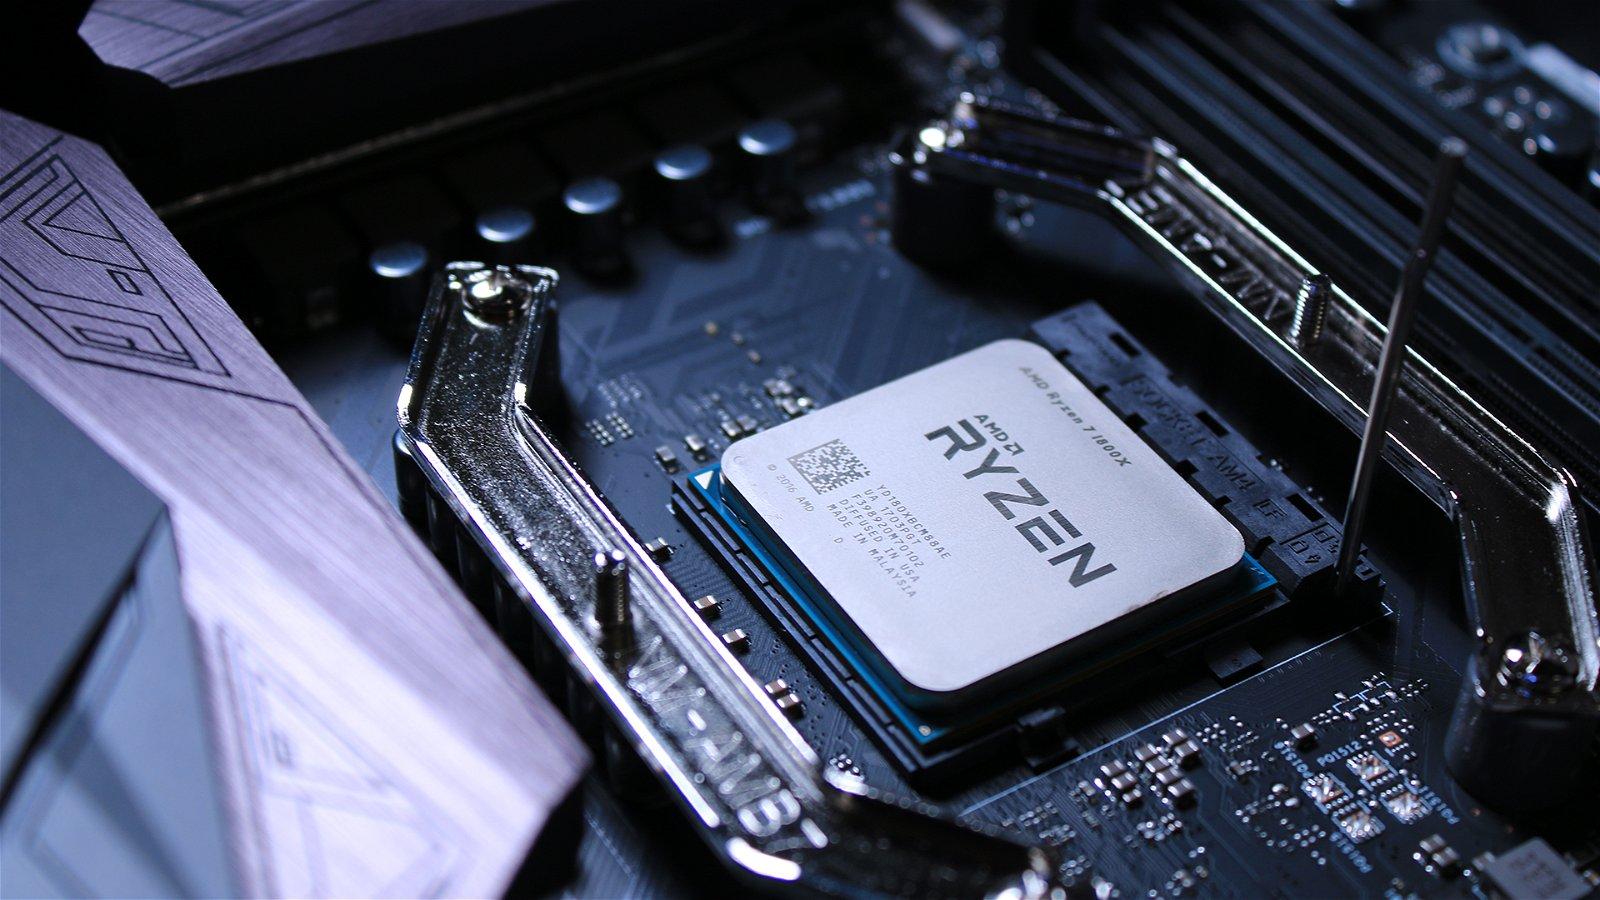 AMD Ryzen 7 1800X (Hardware) Review 2